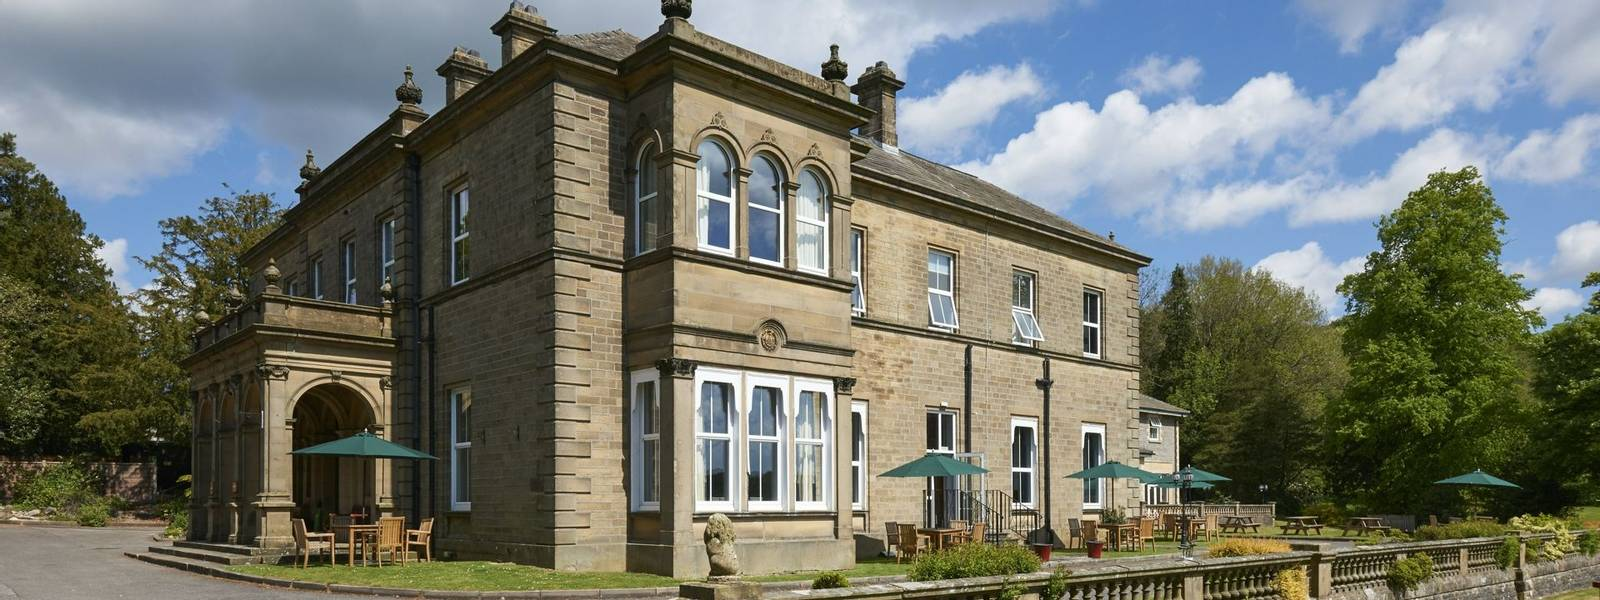 10692_0009 - Newfield Hall - Exterior